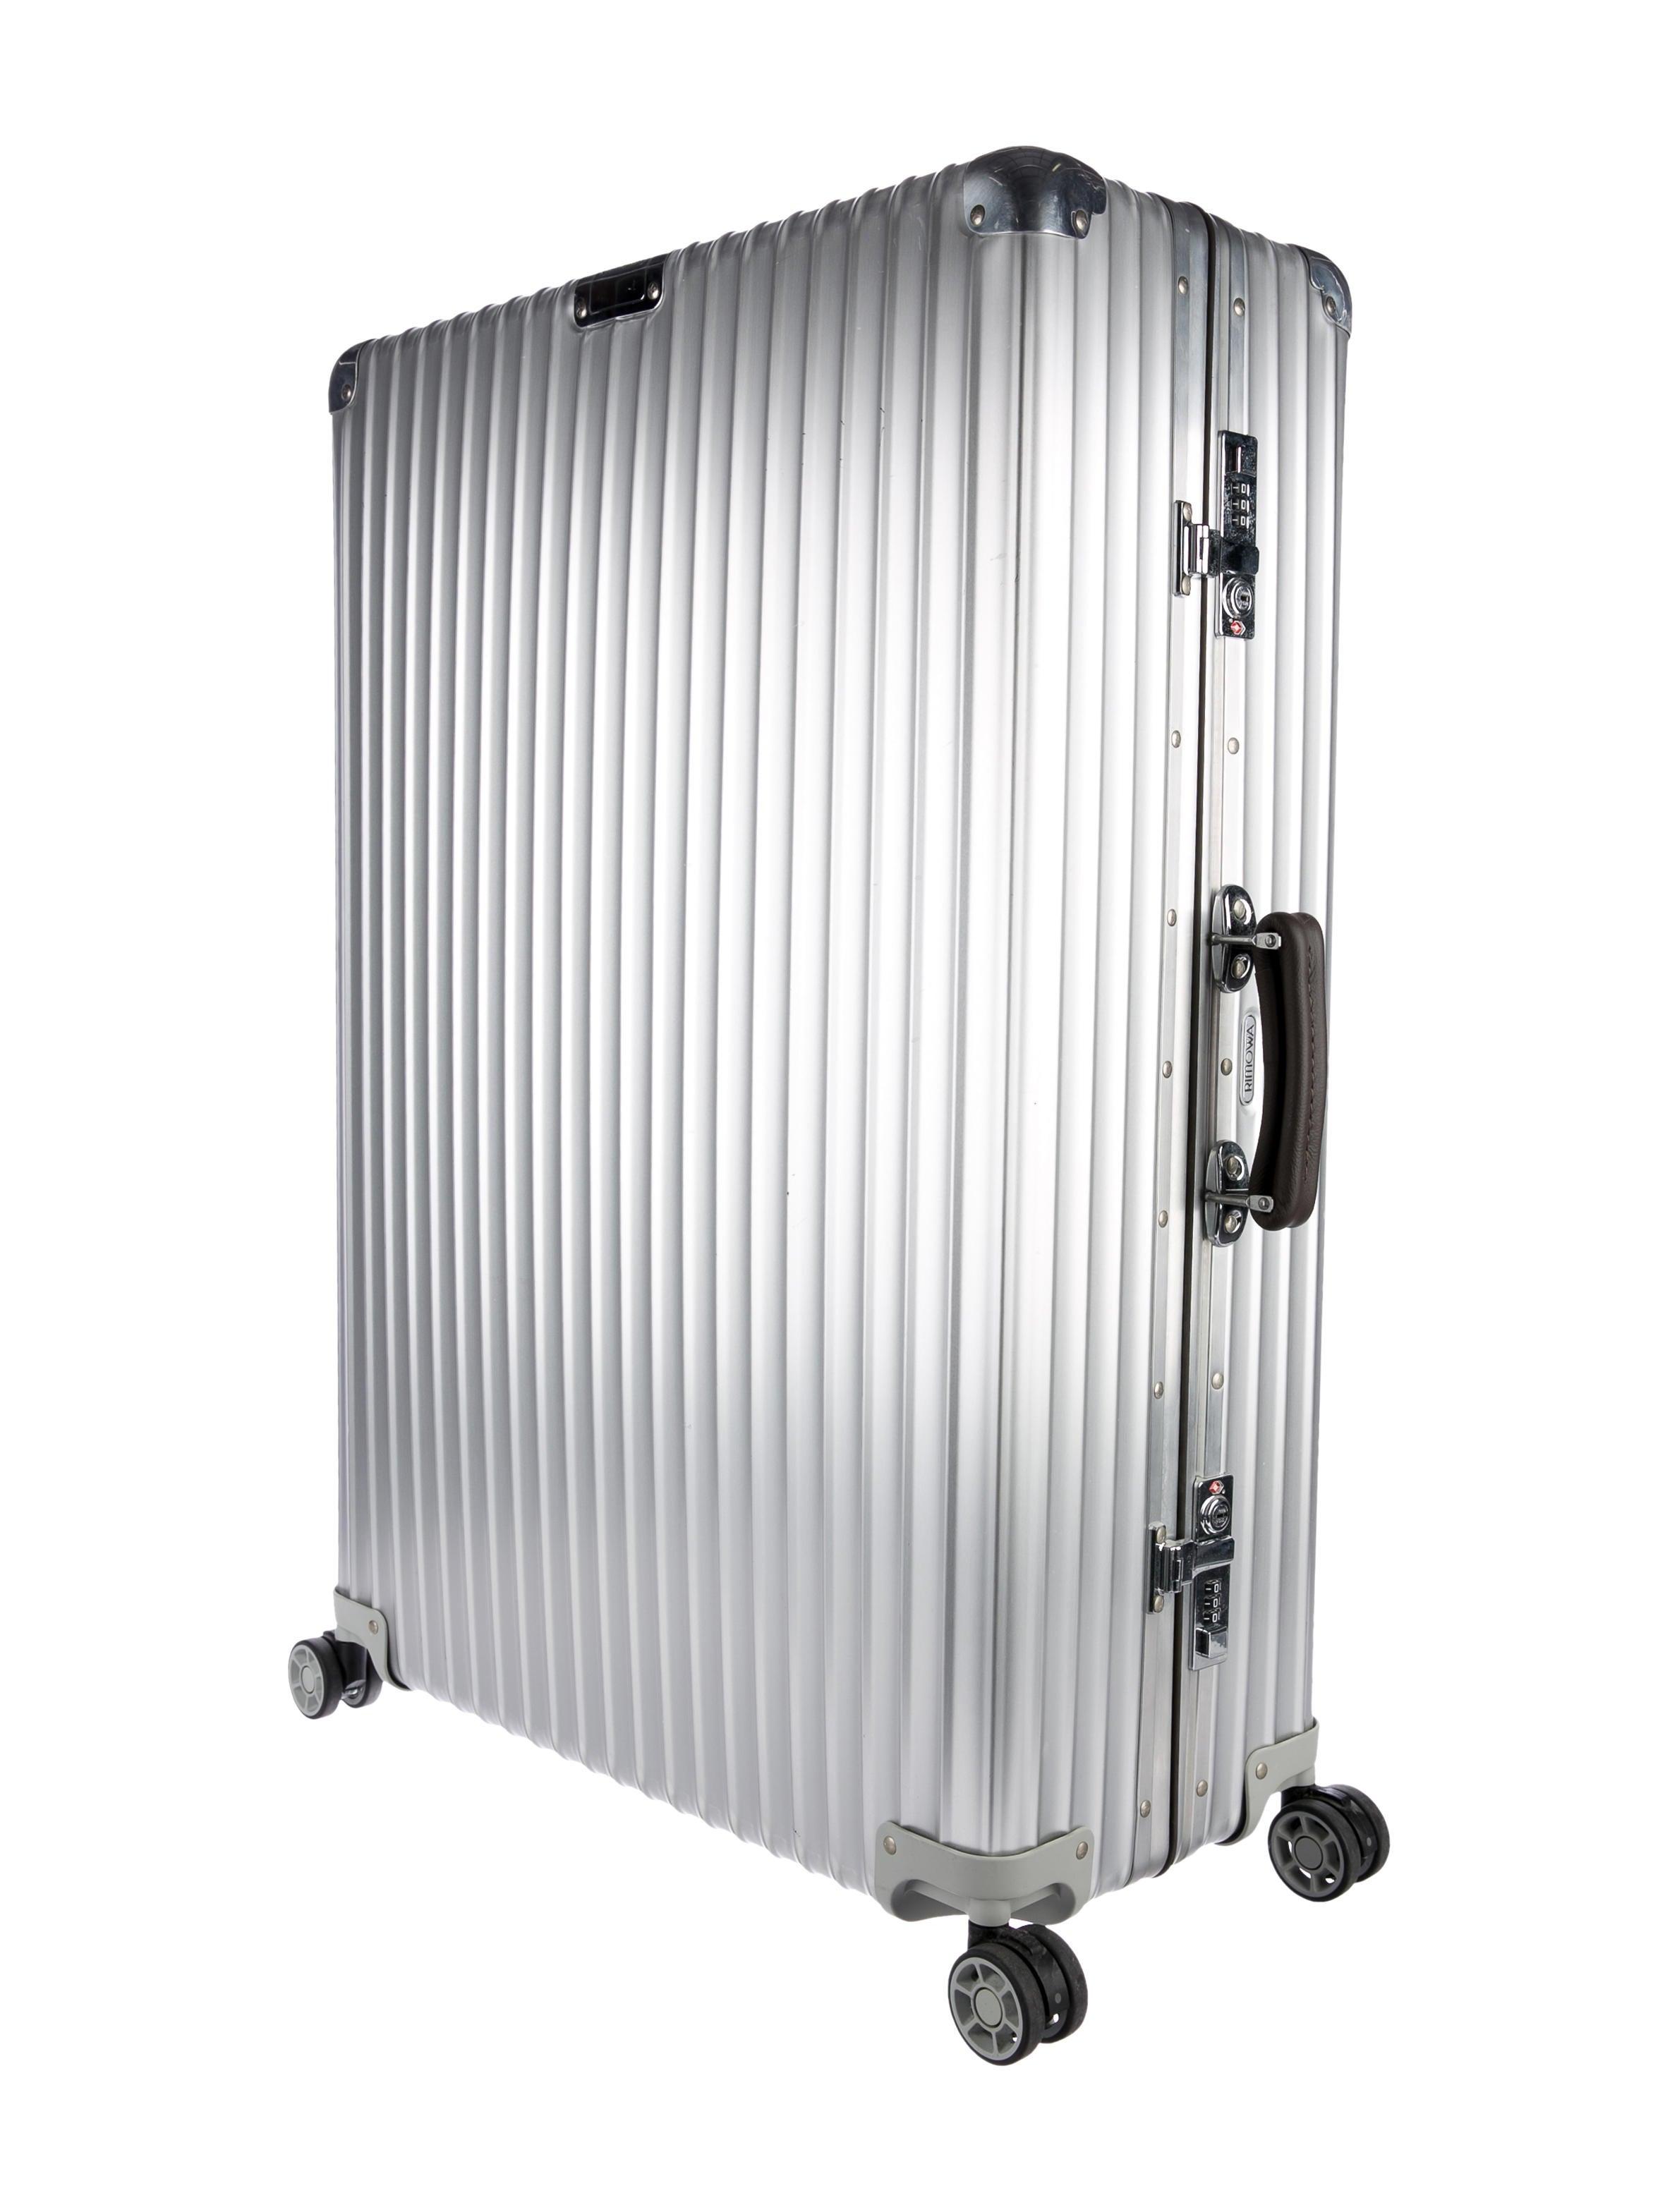 rimowa classic flight cabin multiwheel 85 0l trolley. Black Bedroom Furniture Sets. Home Design Ideas